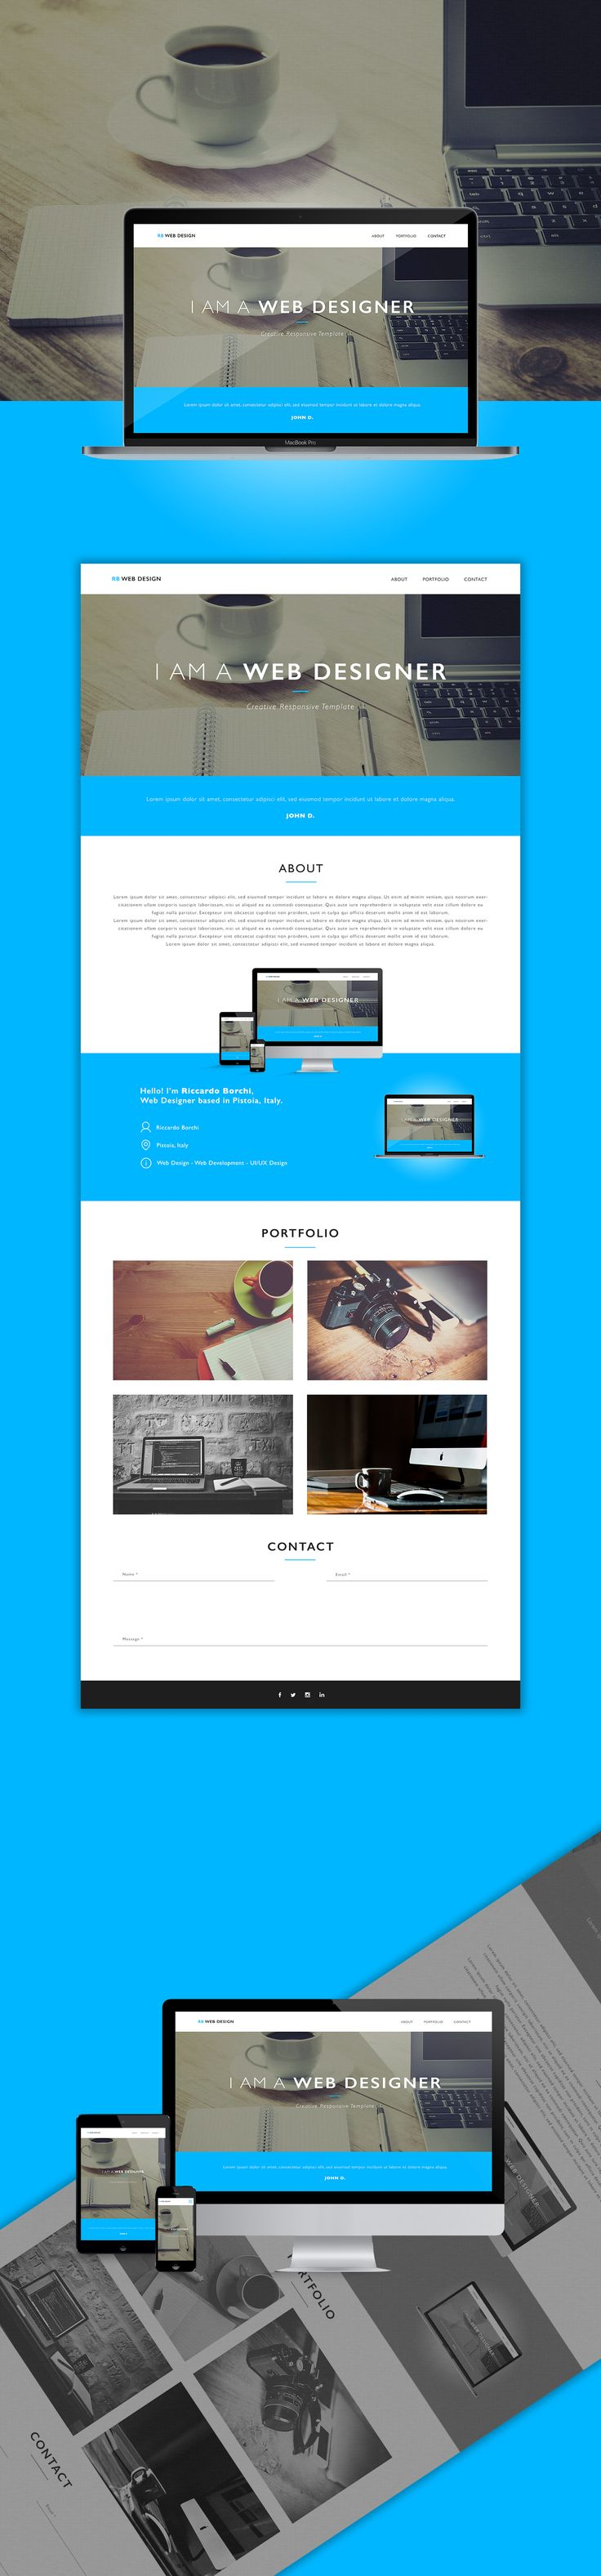 Vedi il mio progetto @Behance: \u201cRB Web Design - Website\u201d https://www.behance.net/gallery/50401743/RB-Web-Design-Website